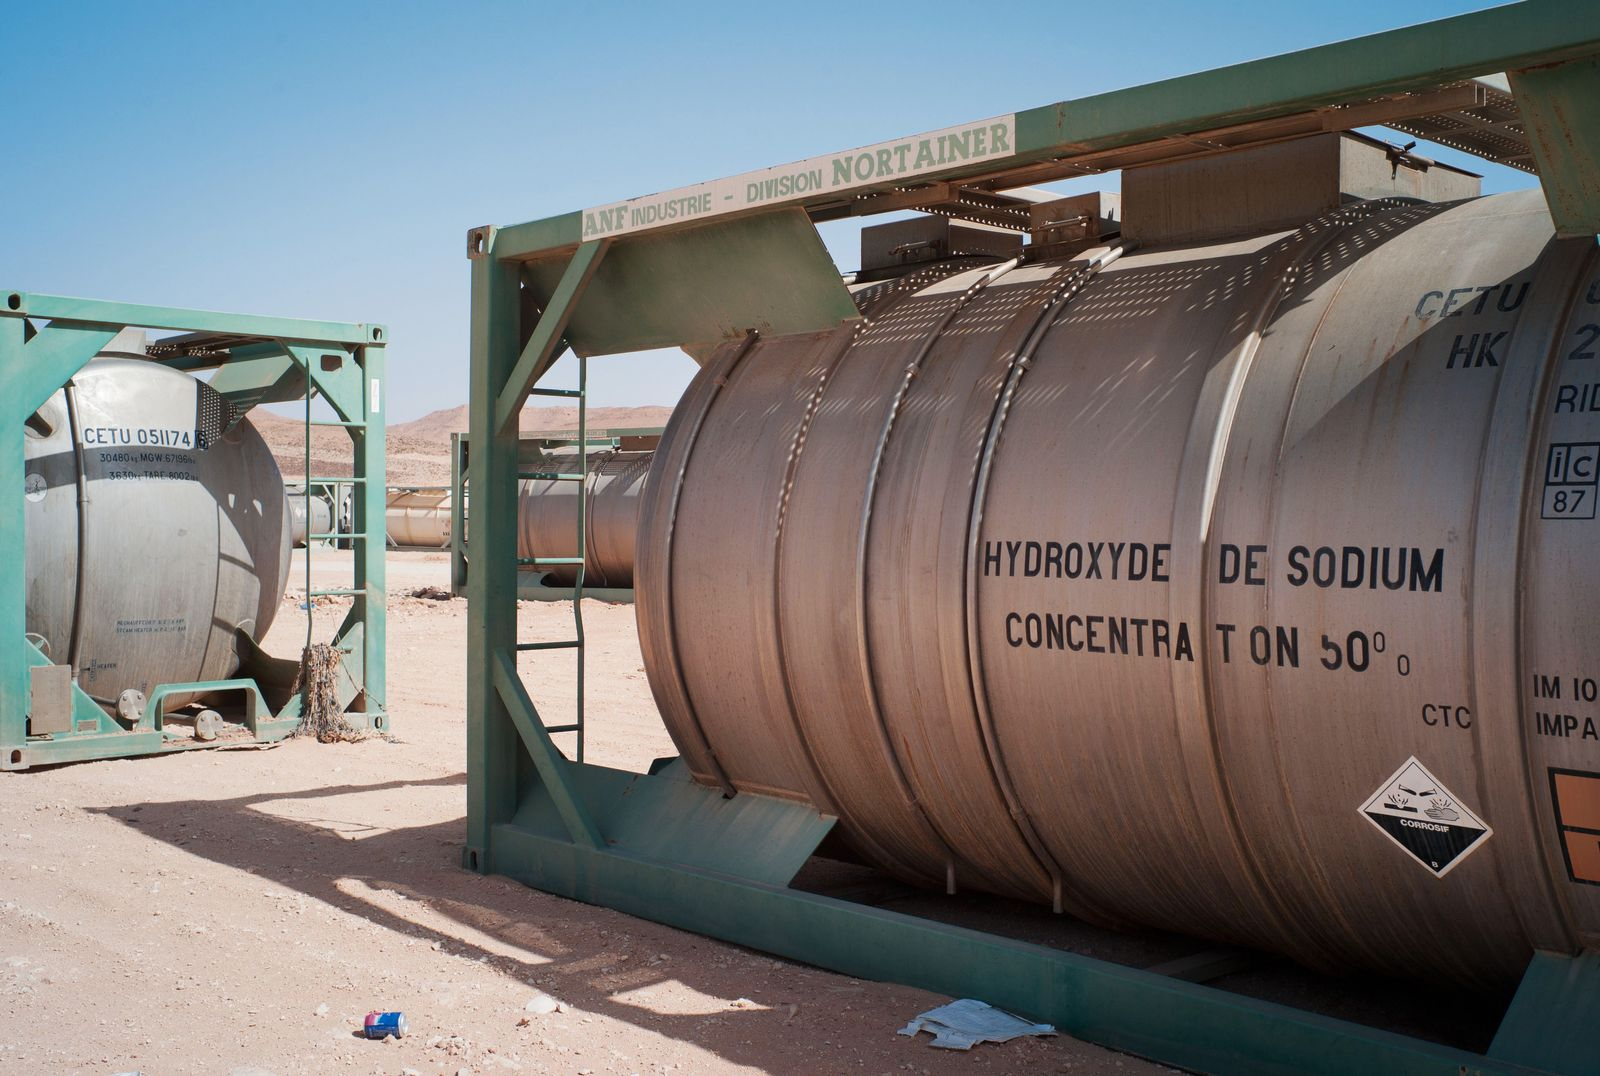 Chemiewaffen / Libyen / Waffenlager Wüste